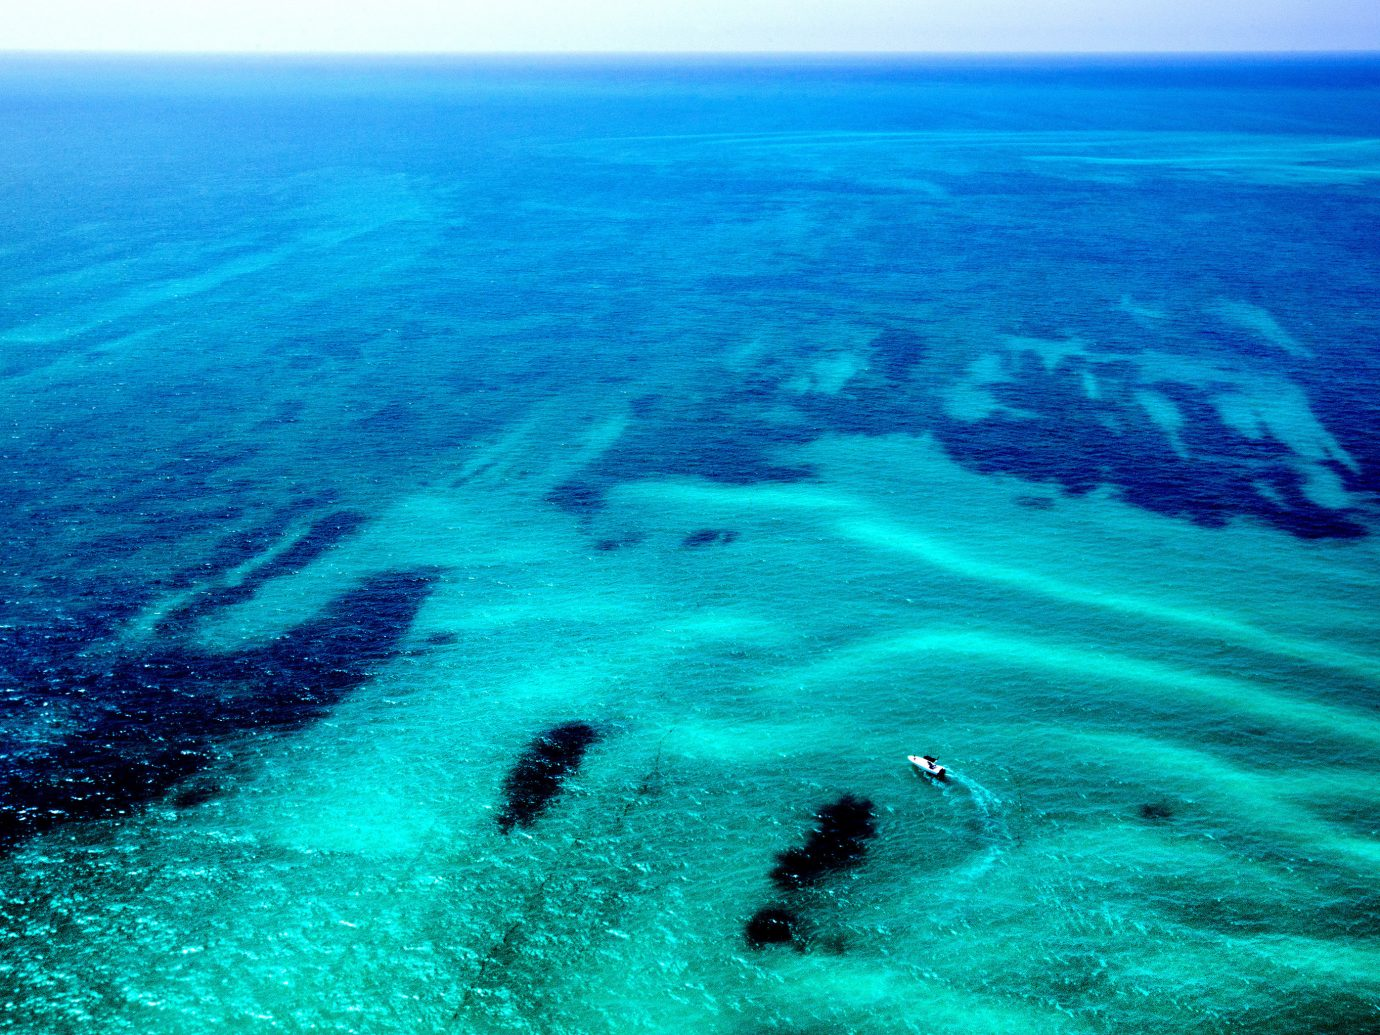 Beach water outdoor geographical feature Nature landform marine biology reef Sea Ocean wind wave wave Coast cape coral reef Island blue ocean floor